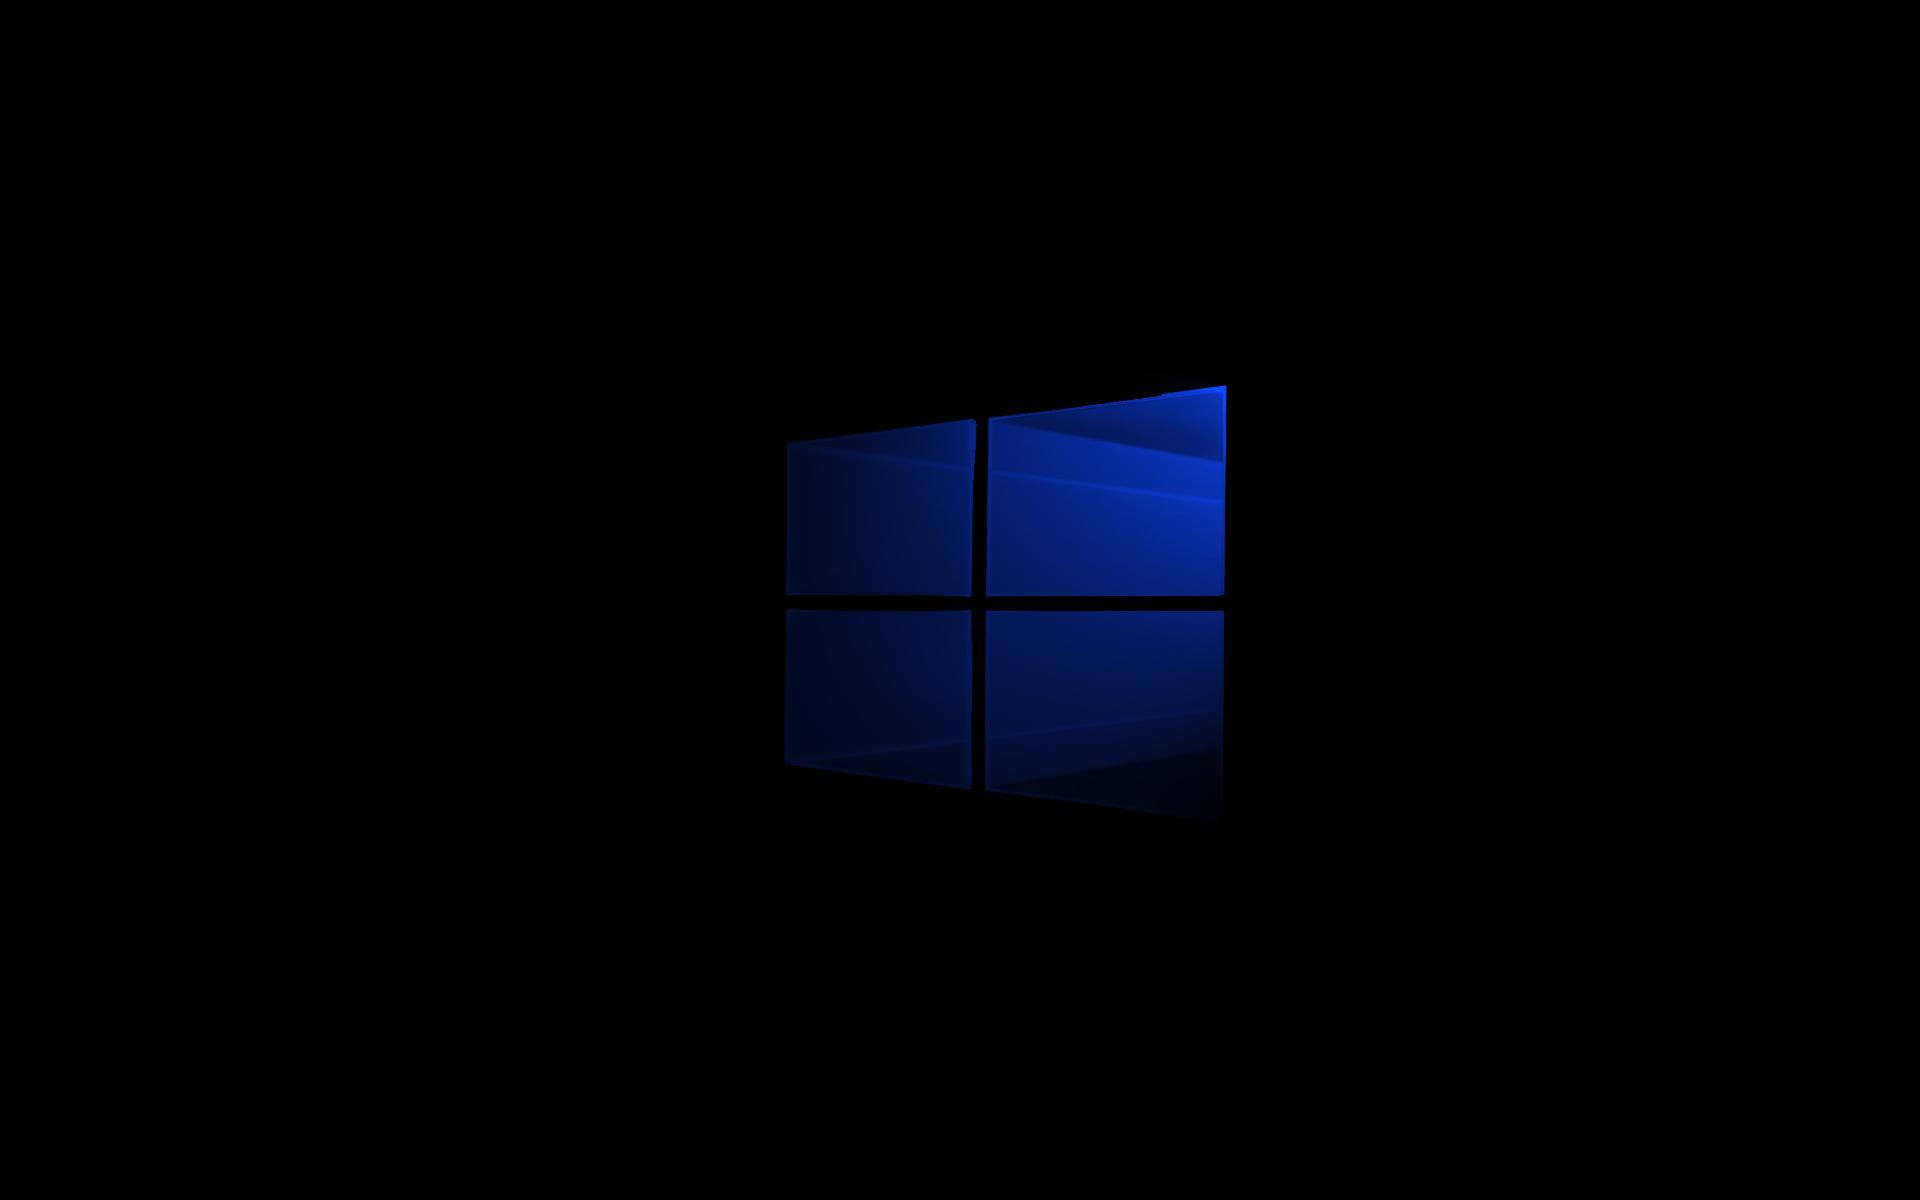 Minimal Windows 10 wallpaper by arcadiogarcia on DeviantArt